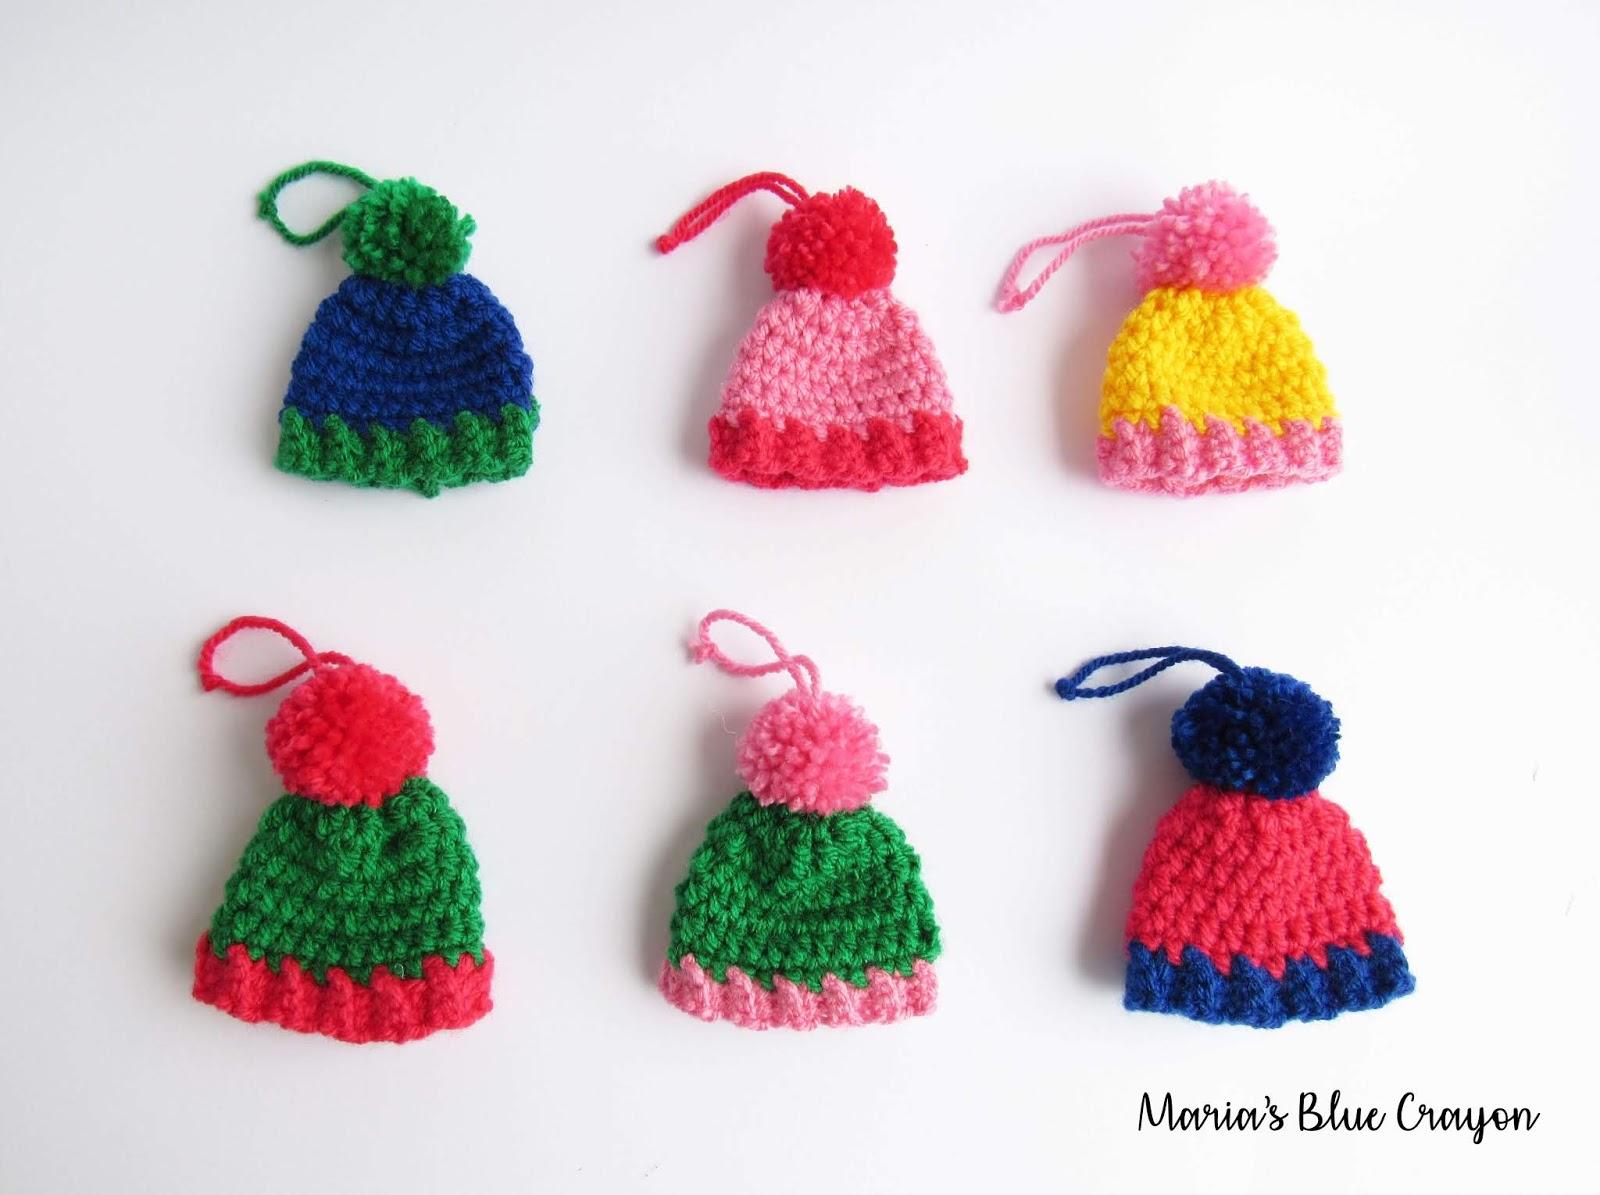 Crochet Christmas Ornaments.Crochet Christmas Ornaments Mini Pom Pom Beanies Free